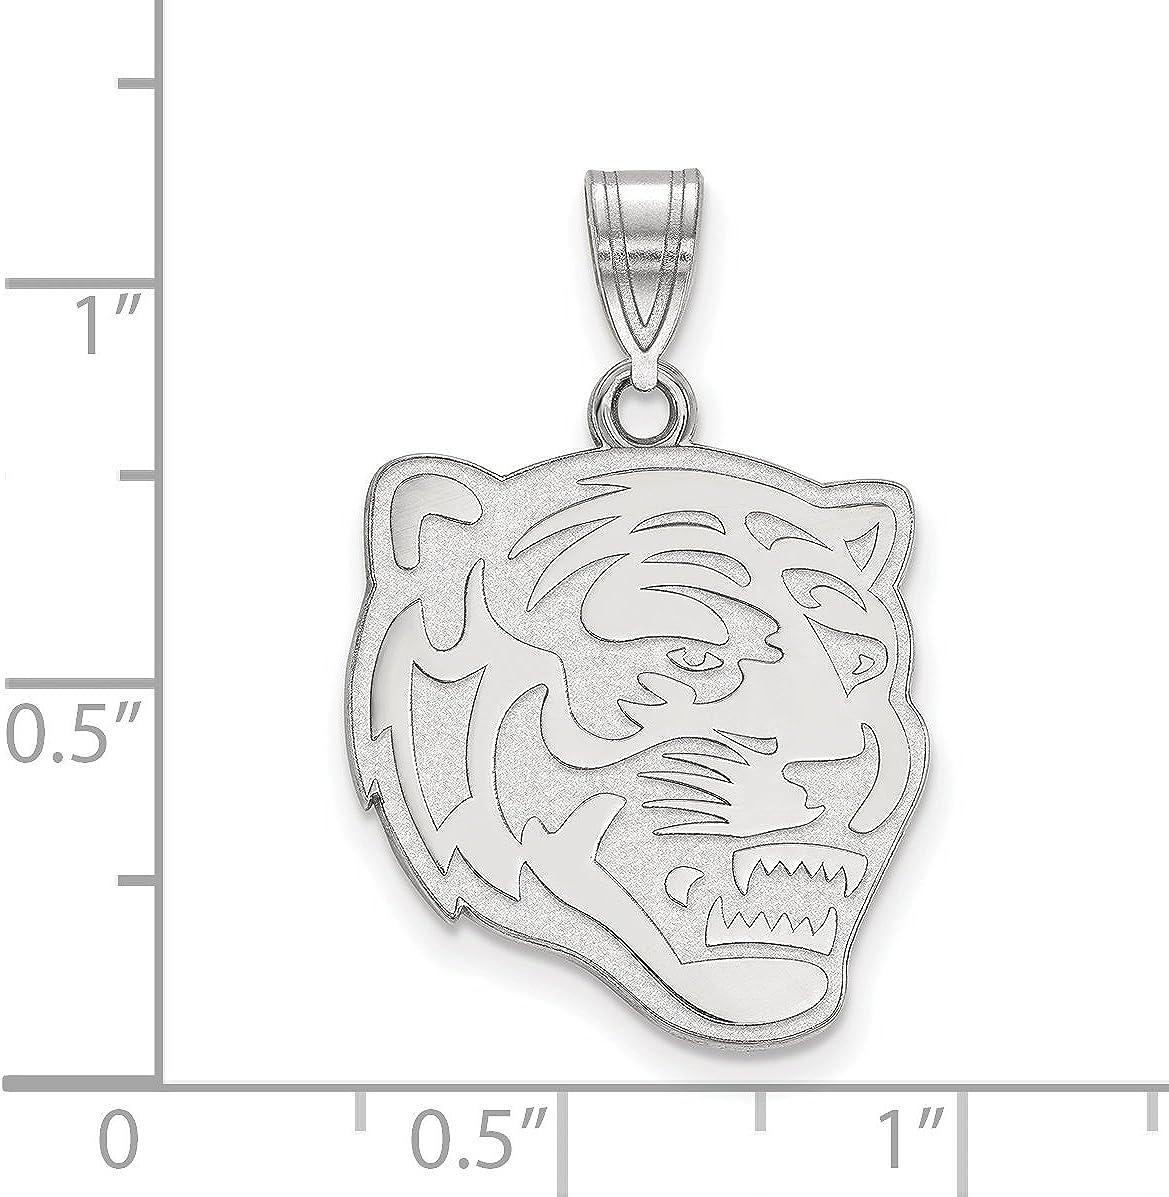 University of Memphis Tigers School Mascot Head Pendant in Sterling Silver